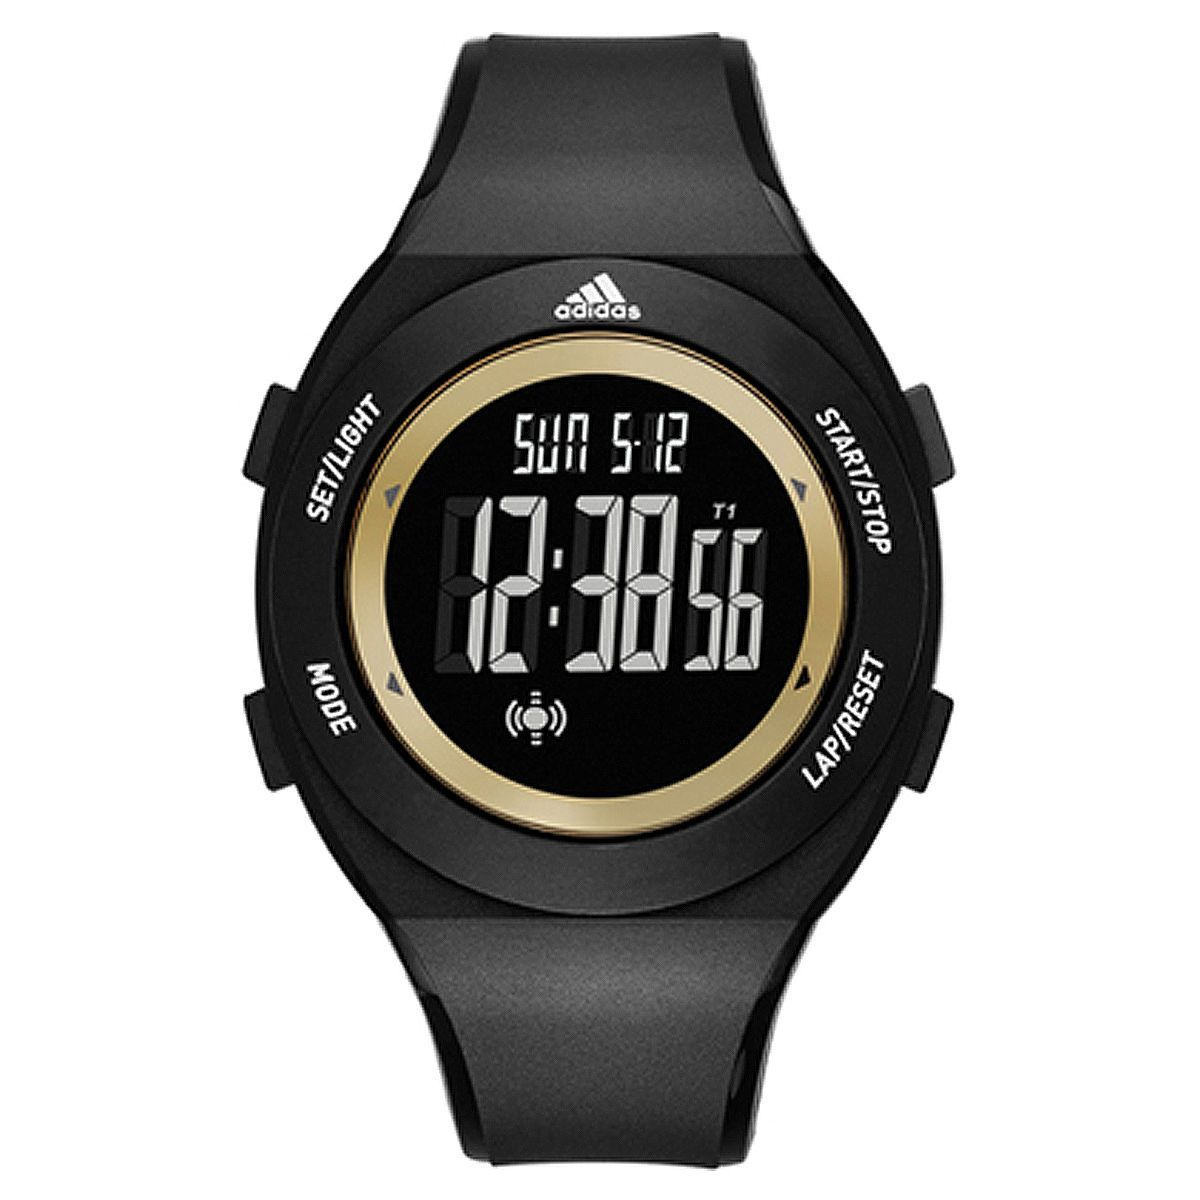 Adidas Reloj   Casual Casual para Adp3208 hombre digital Adp3208   983a679 - accademiadellescienzedellumbria.xyz